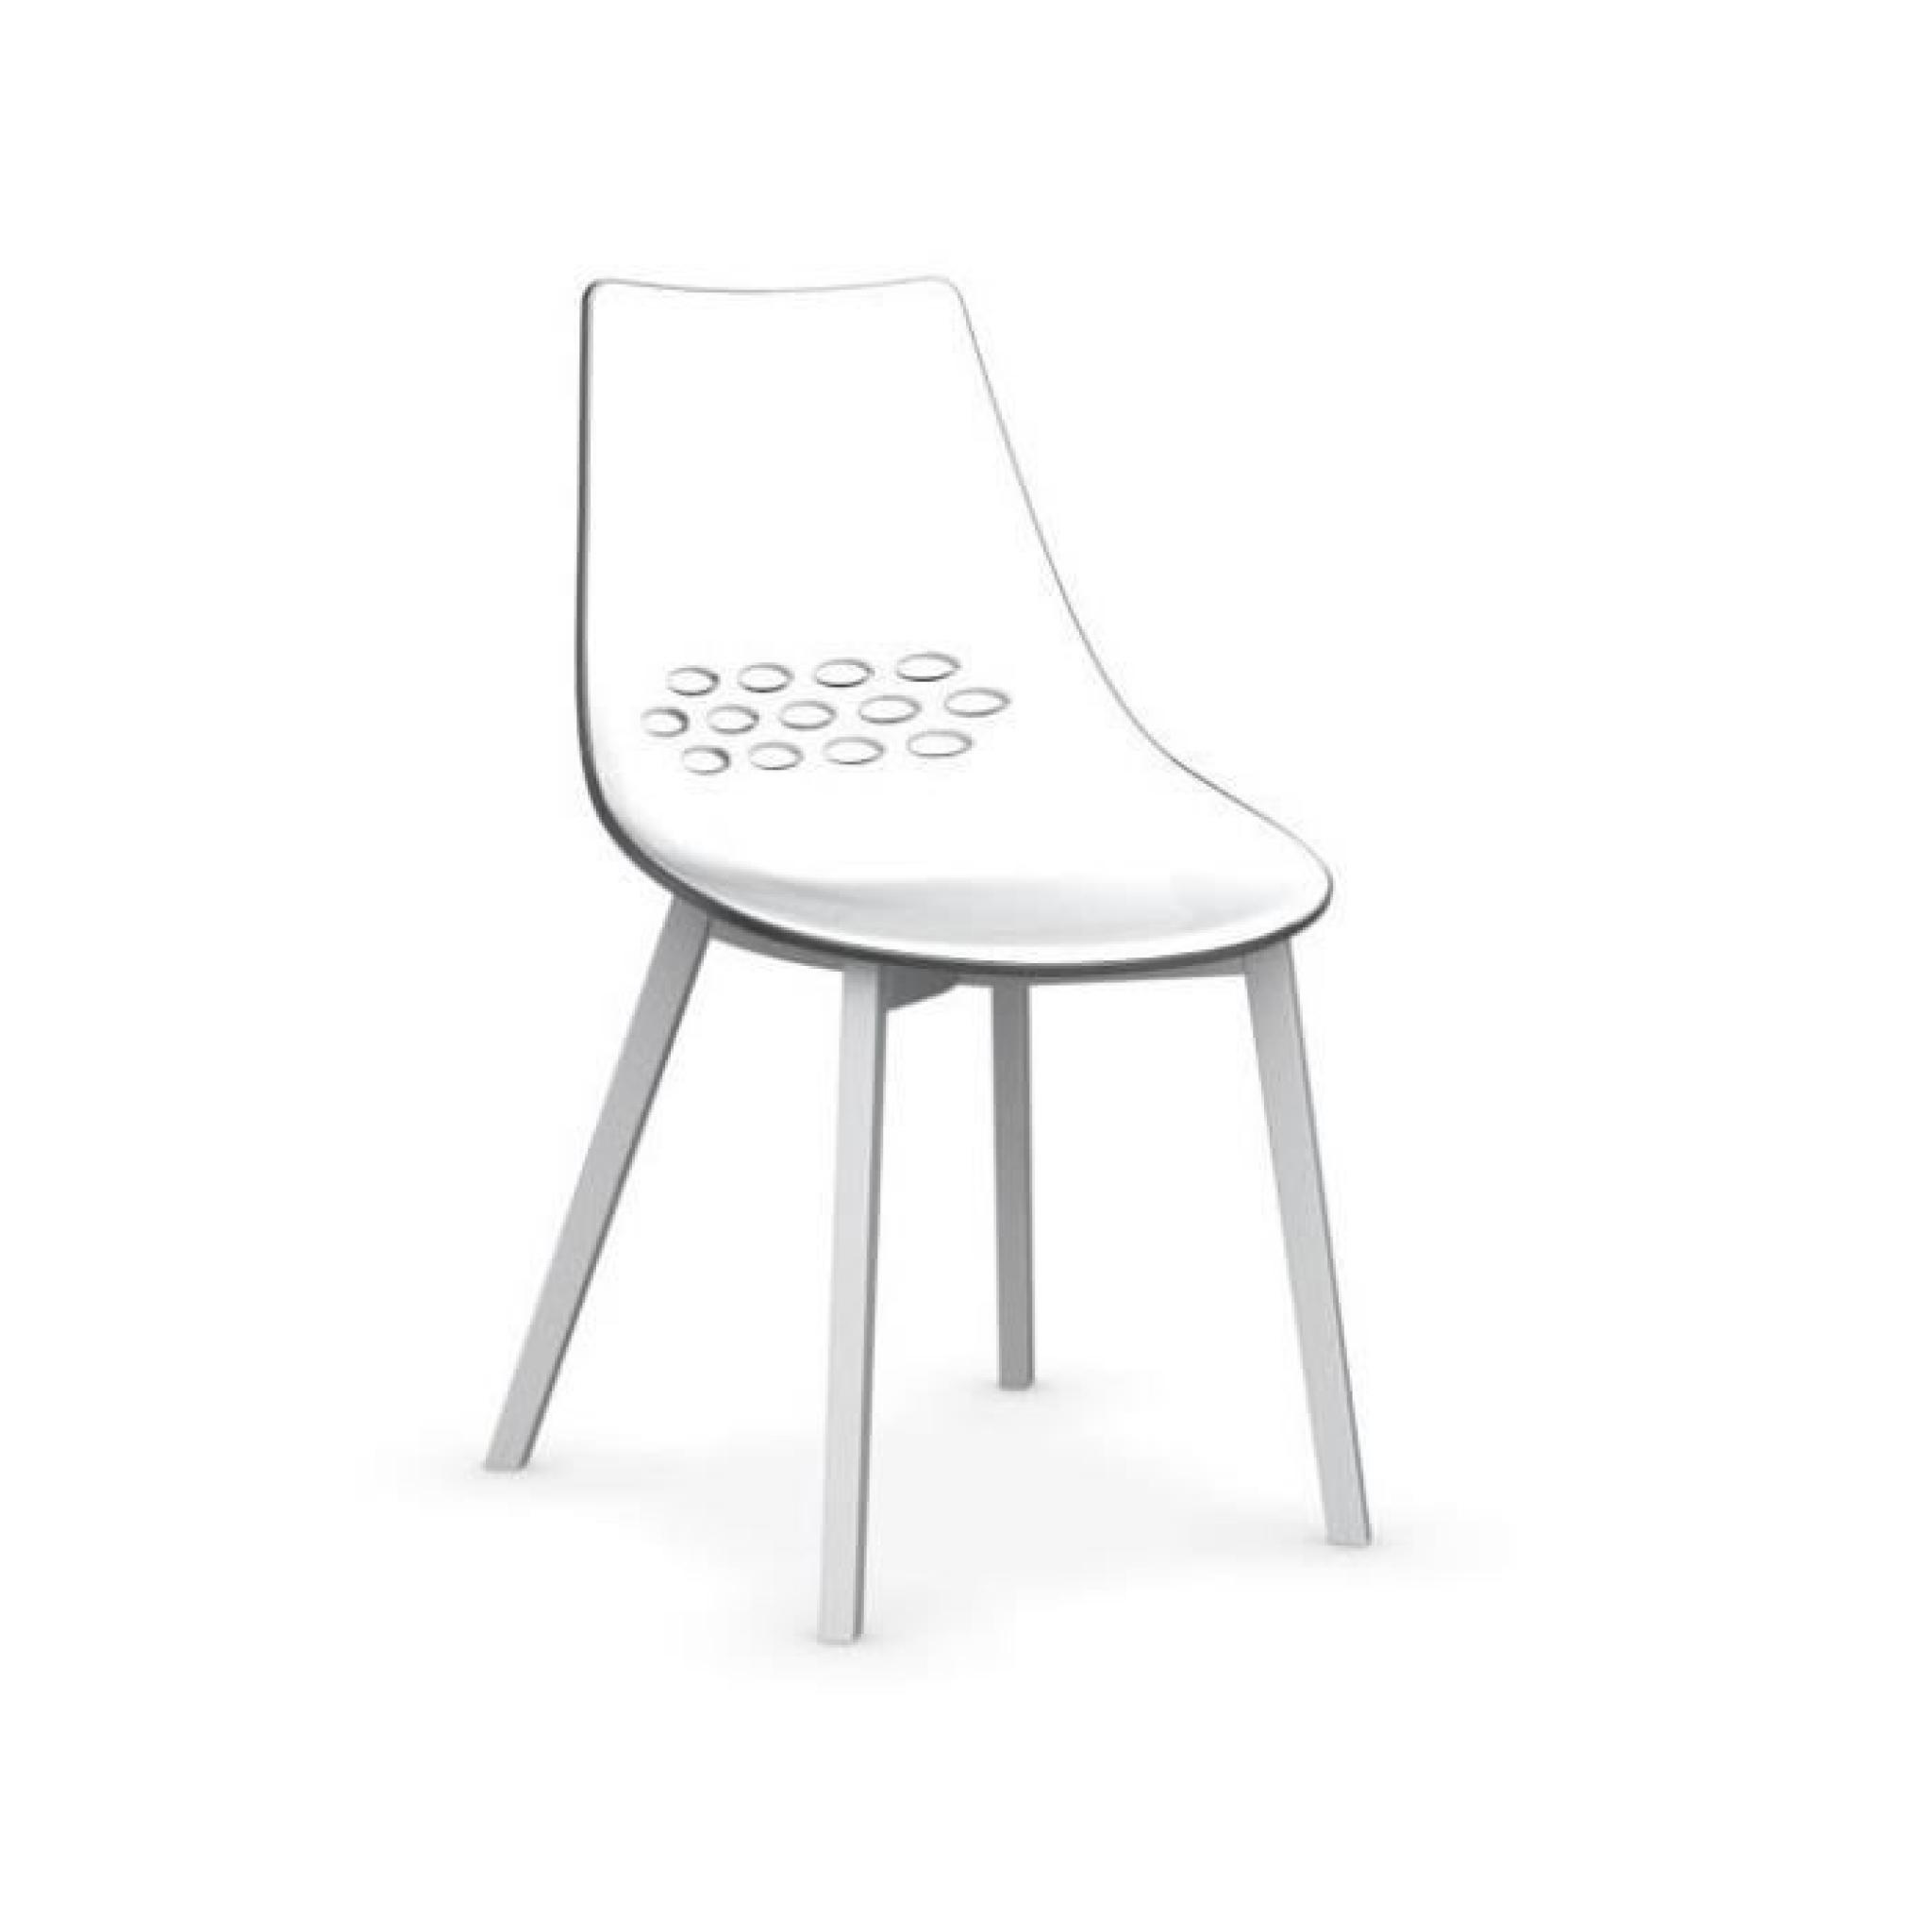 Chaise Jam W De Calligaris Transparente Pietement Blanc Optique